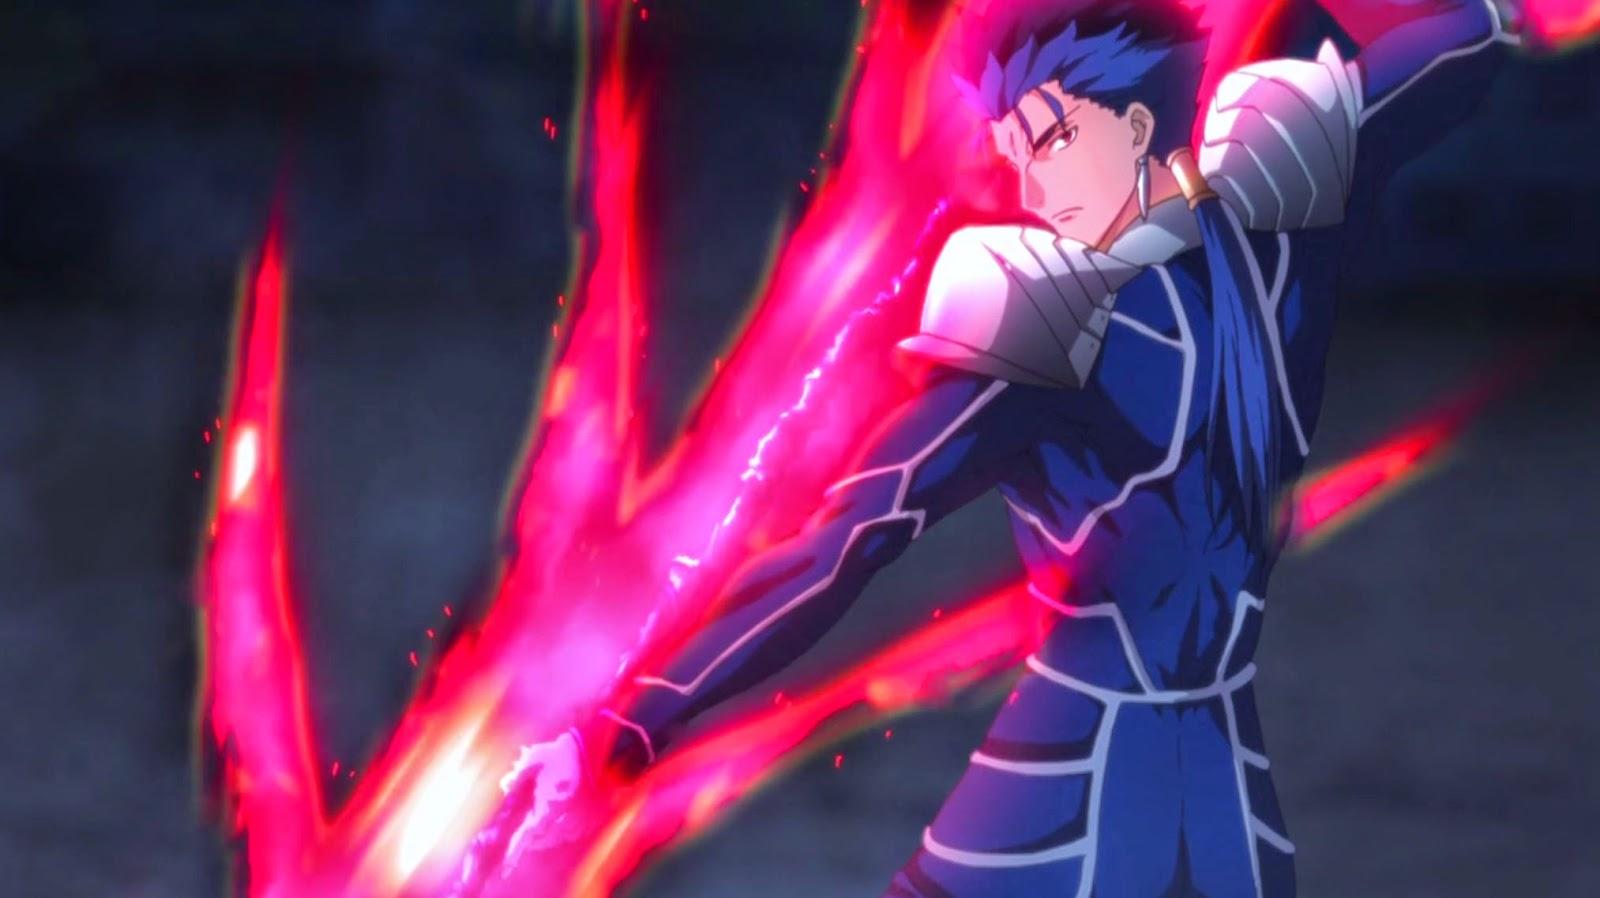 Cu Chulainn Servant Kelas Lancer Sedang Bersiap Menggunakan Phantasm Noble Nya Gae Bolg